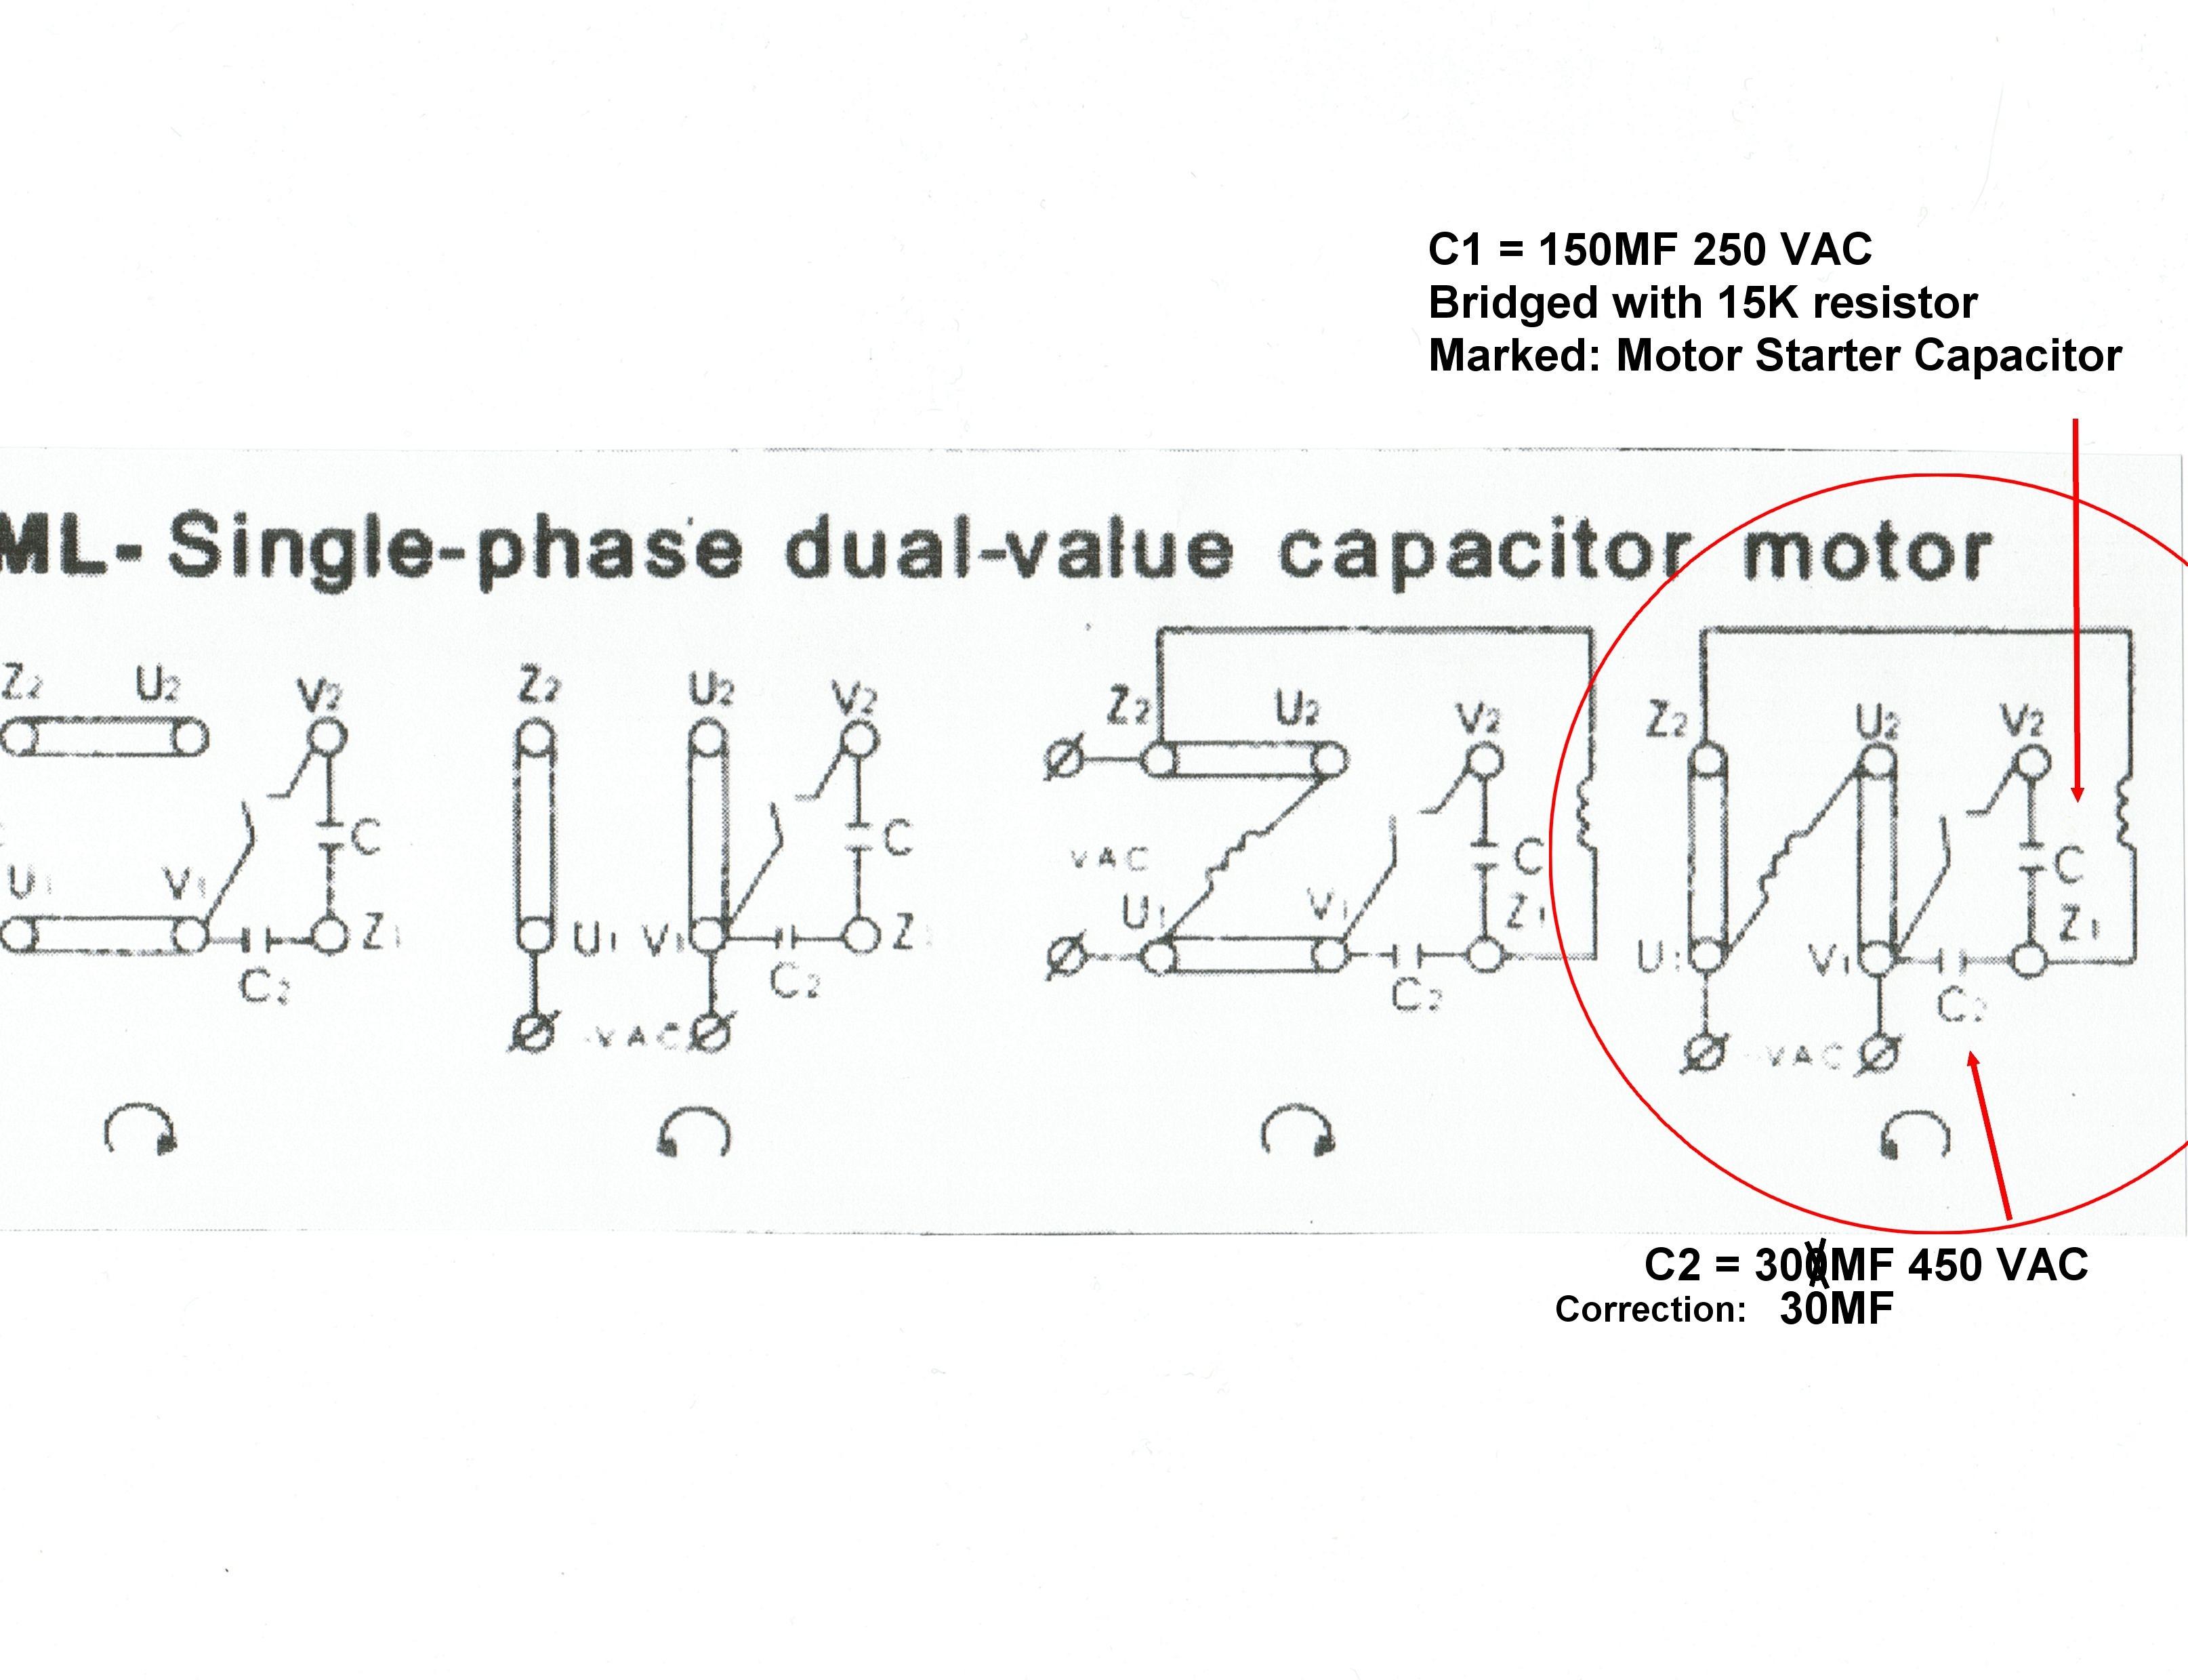 Single Phase Capacitor Motor Wiring Diagrams | Wiring Diagram - Single Phase Motor Wiring Diagram With Capacitor